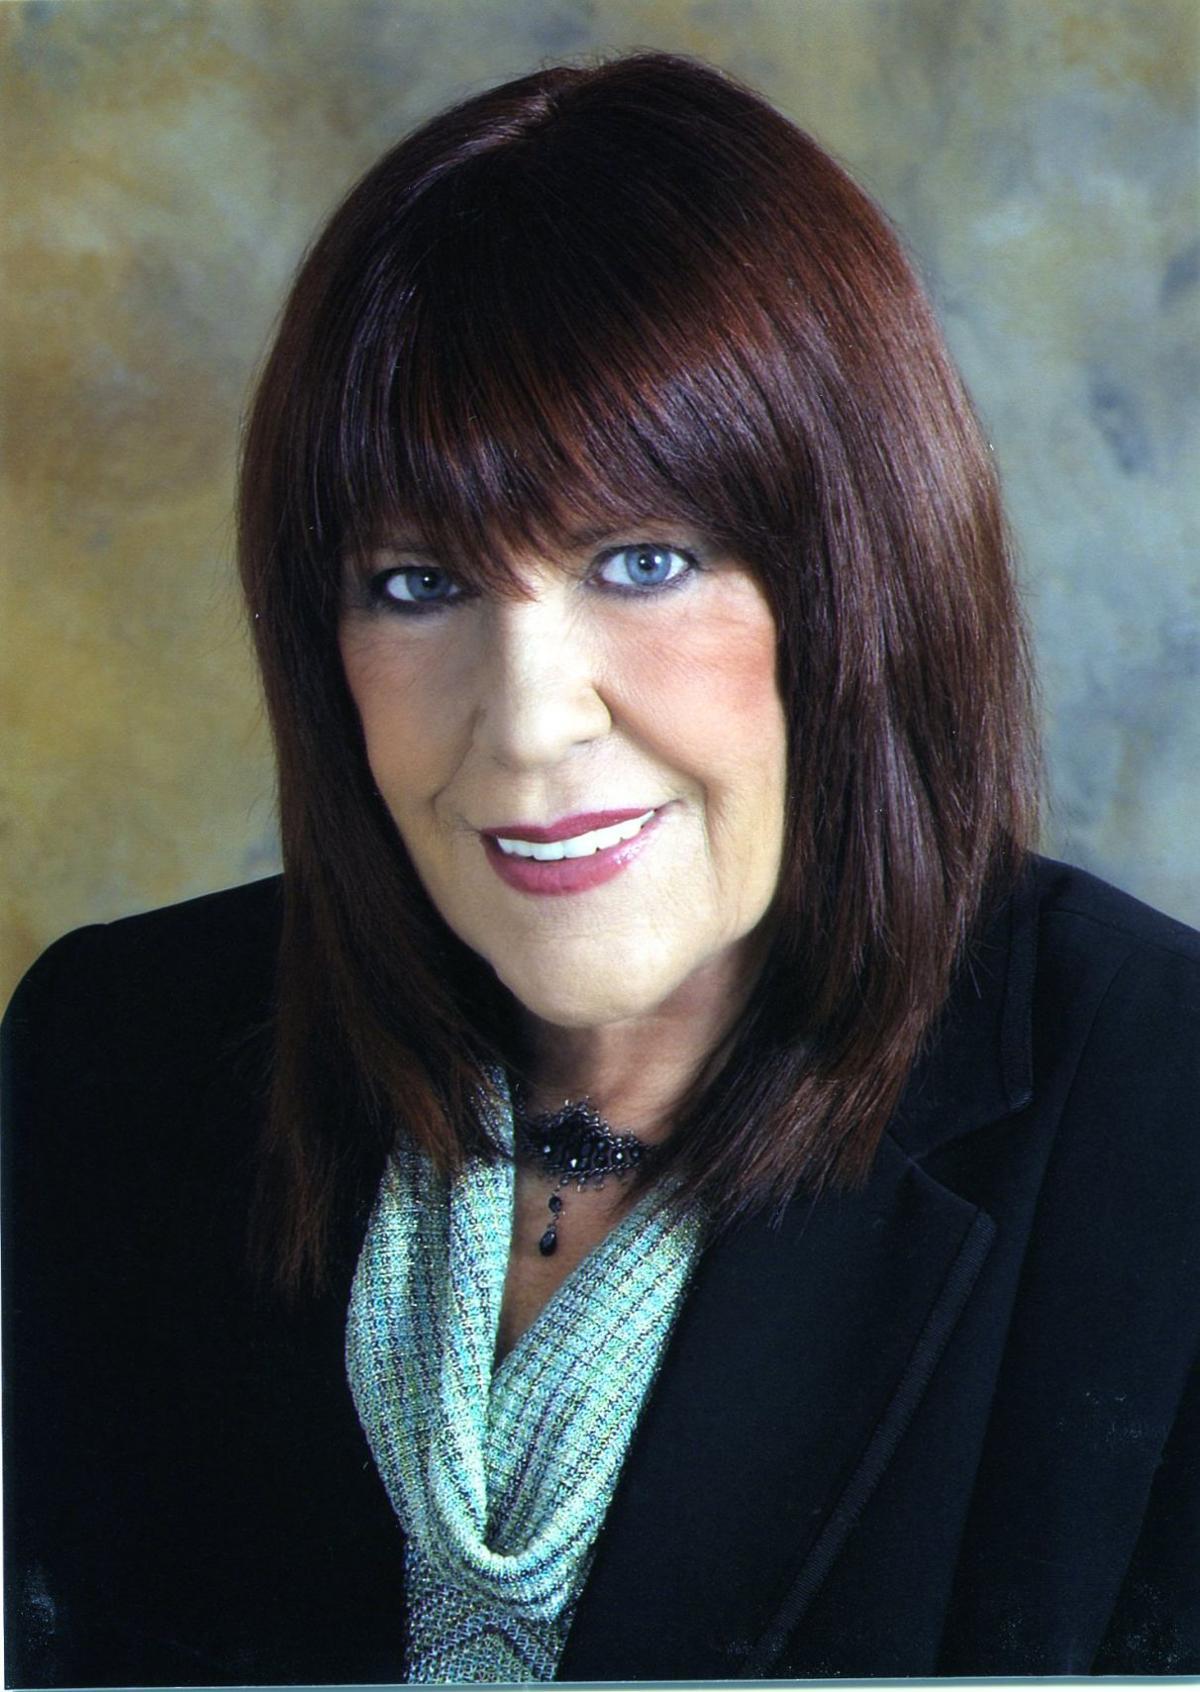 Deborah L. McKnight, 1948-2017